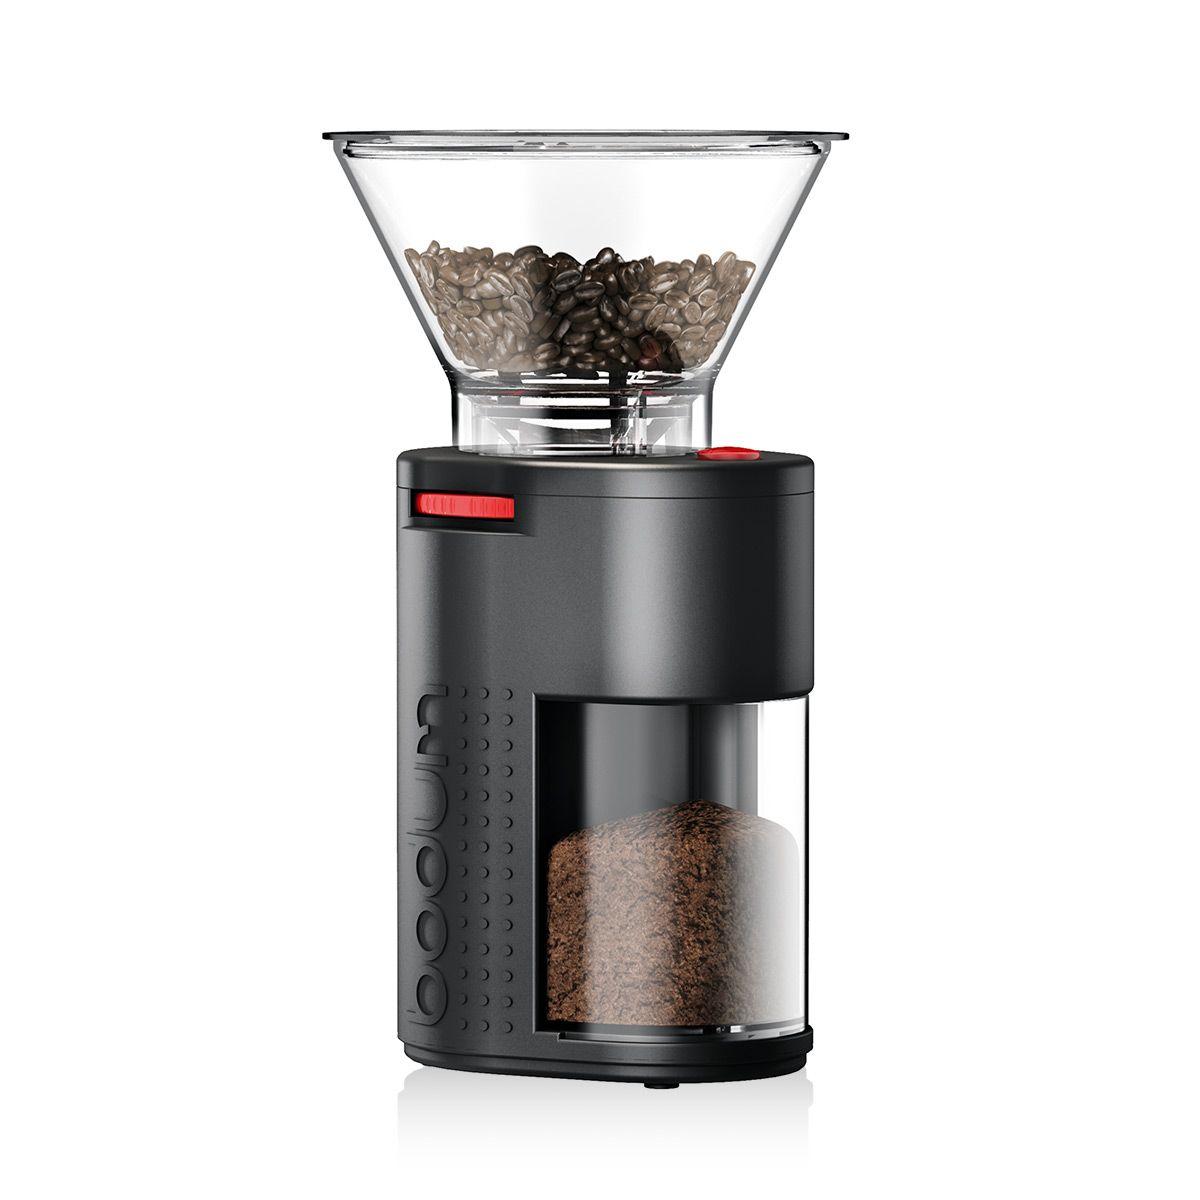 BODUM Electric Coffee Grinder BISTRO - 220g